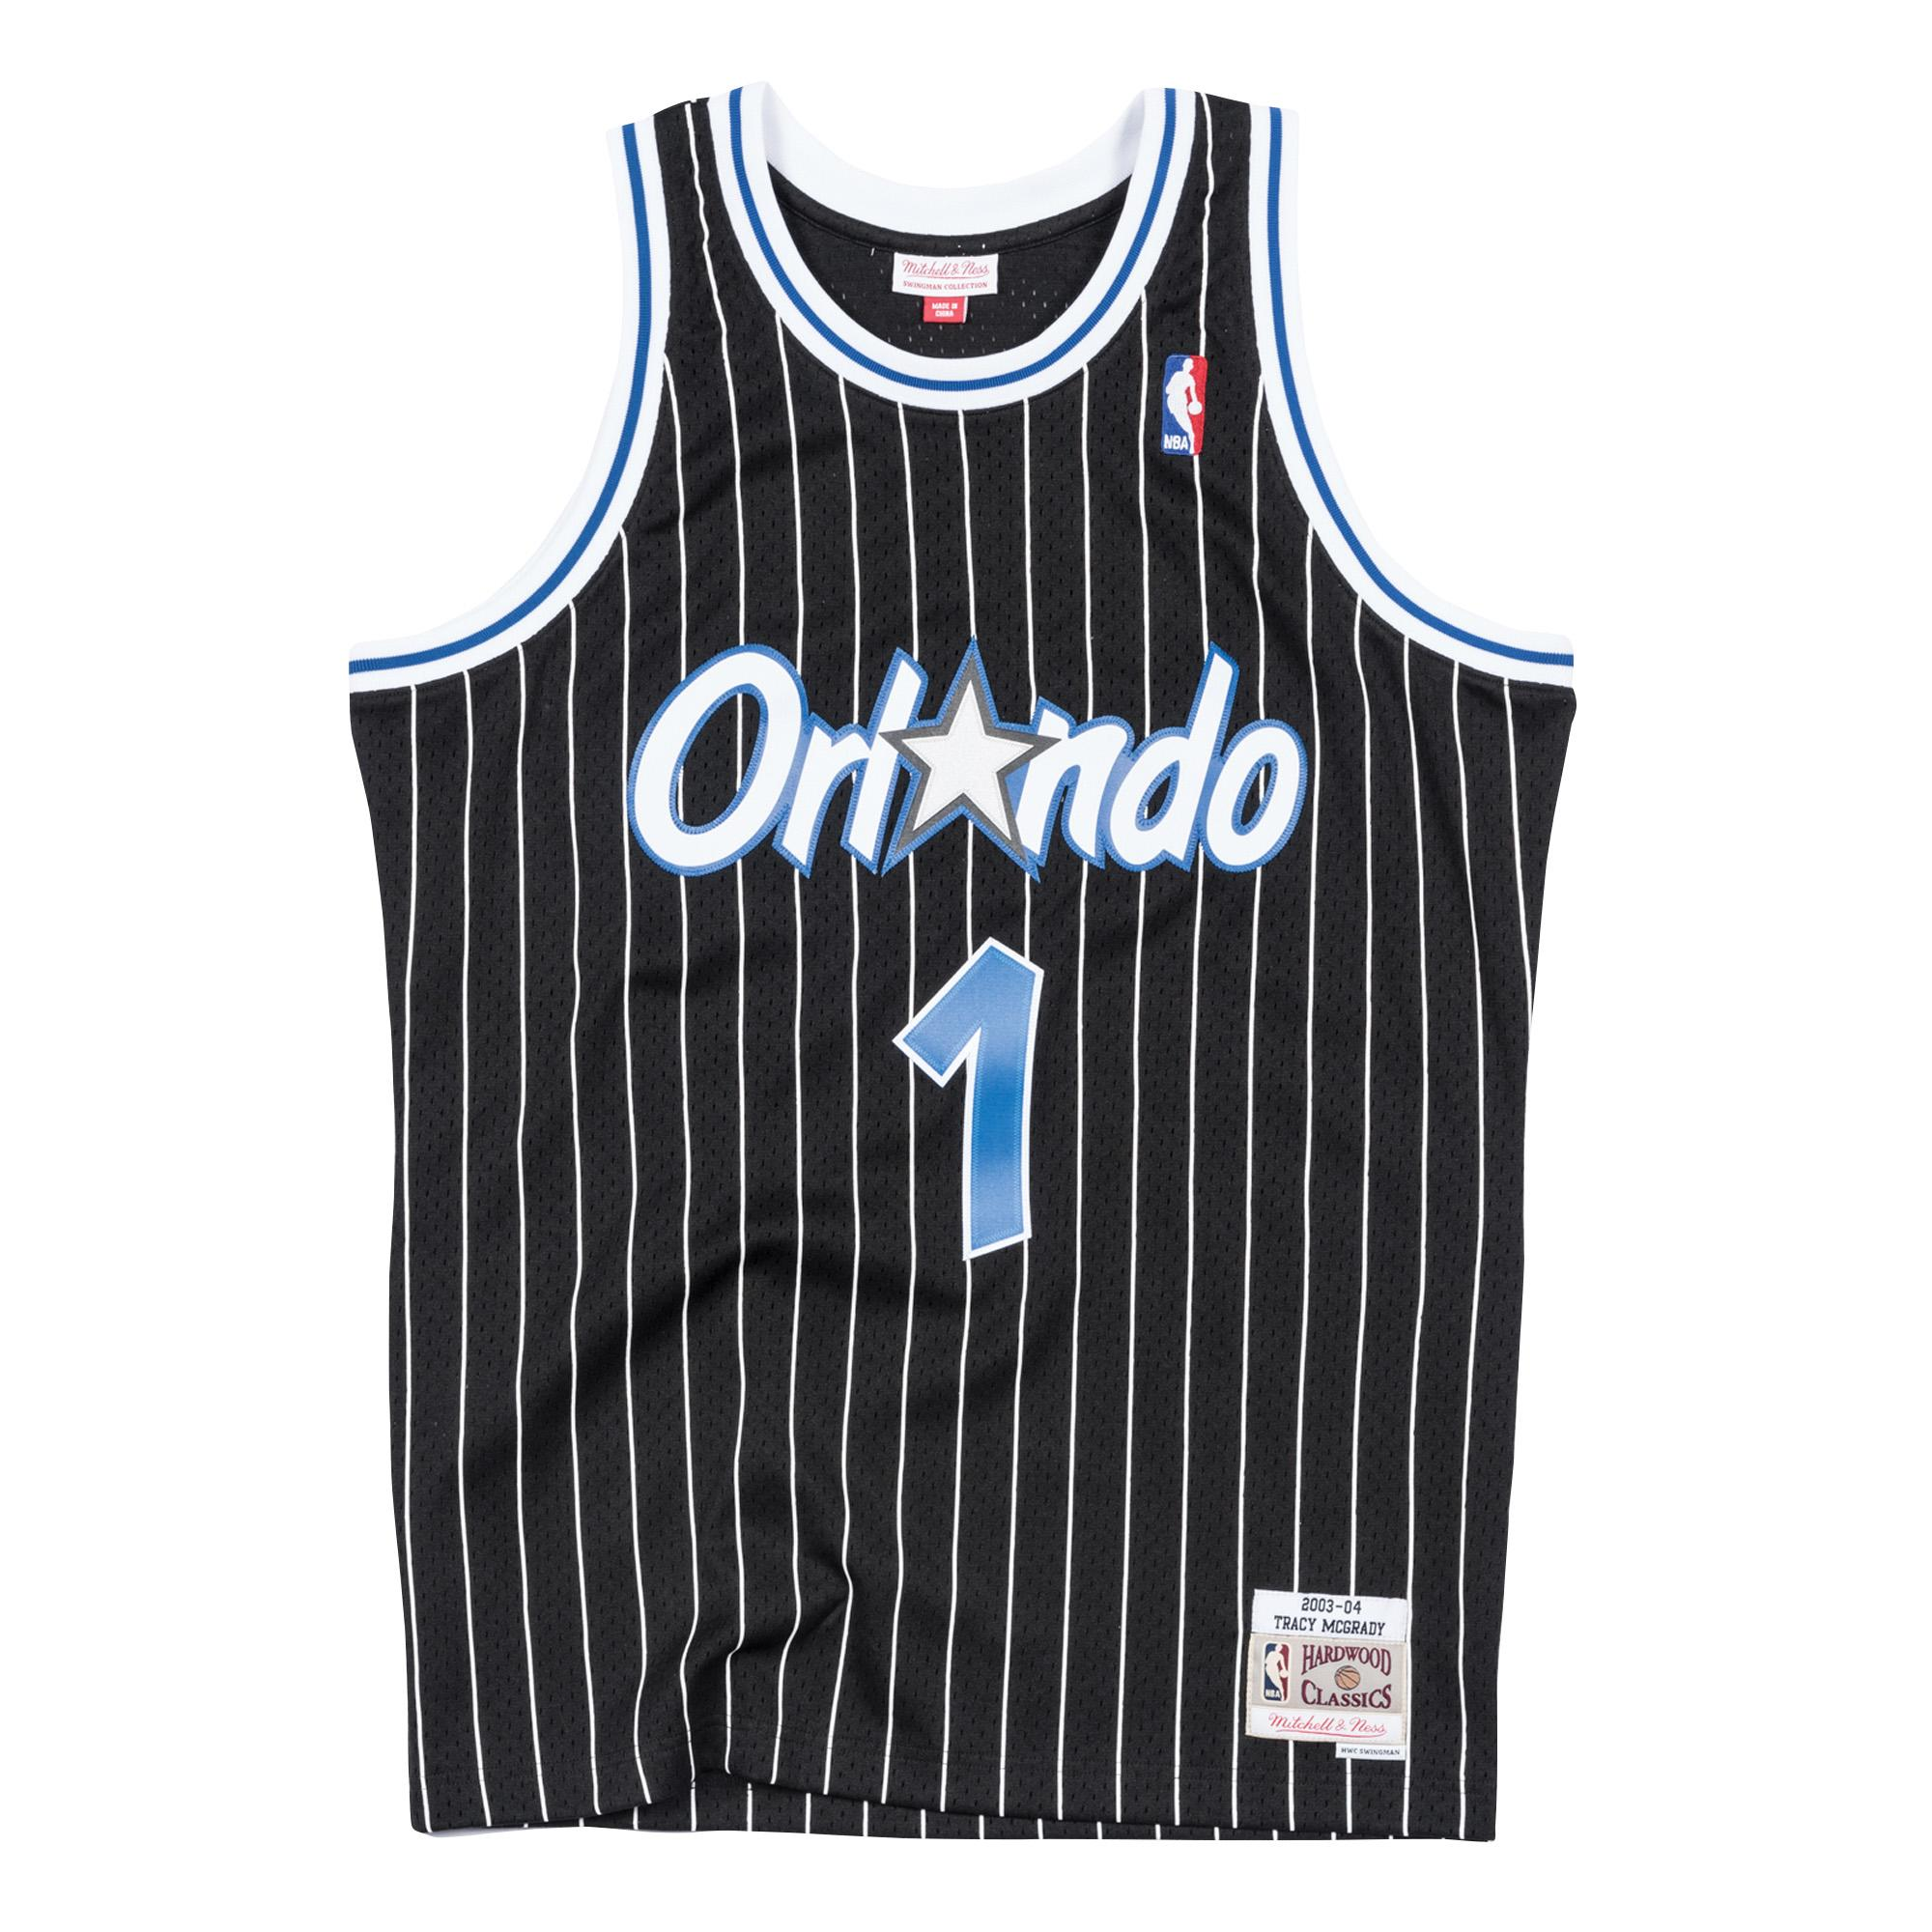 Tracy McGrady 2003-04 Swingman Jersey Orlando Magic 341a93e45